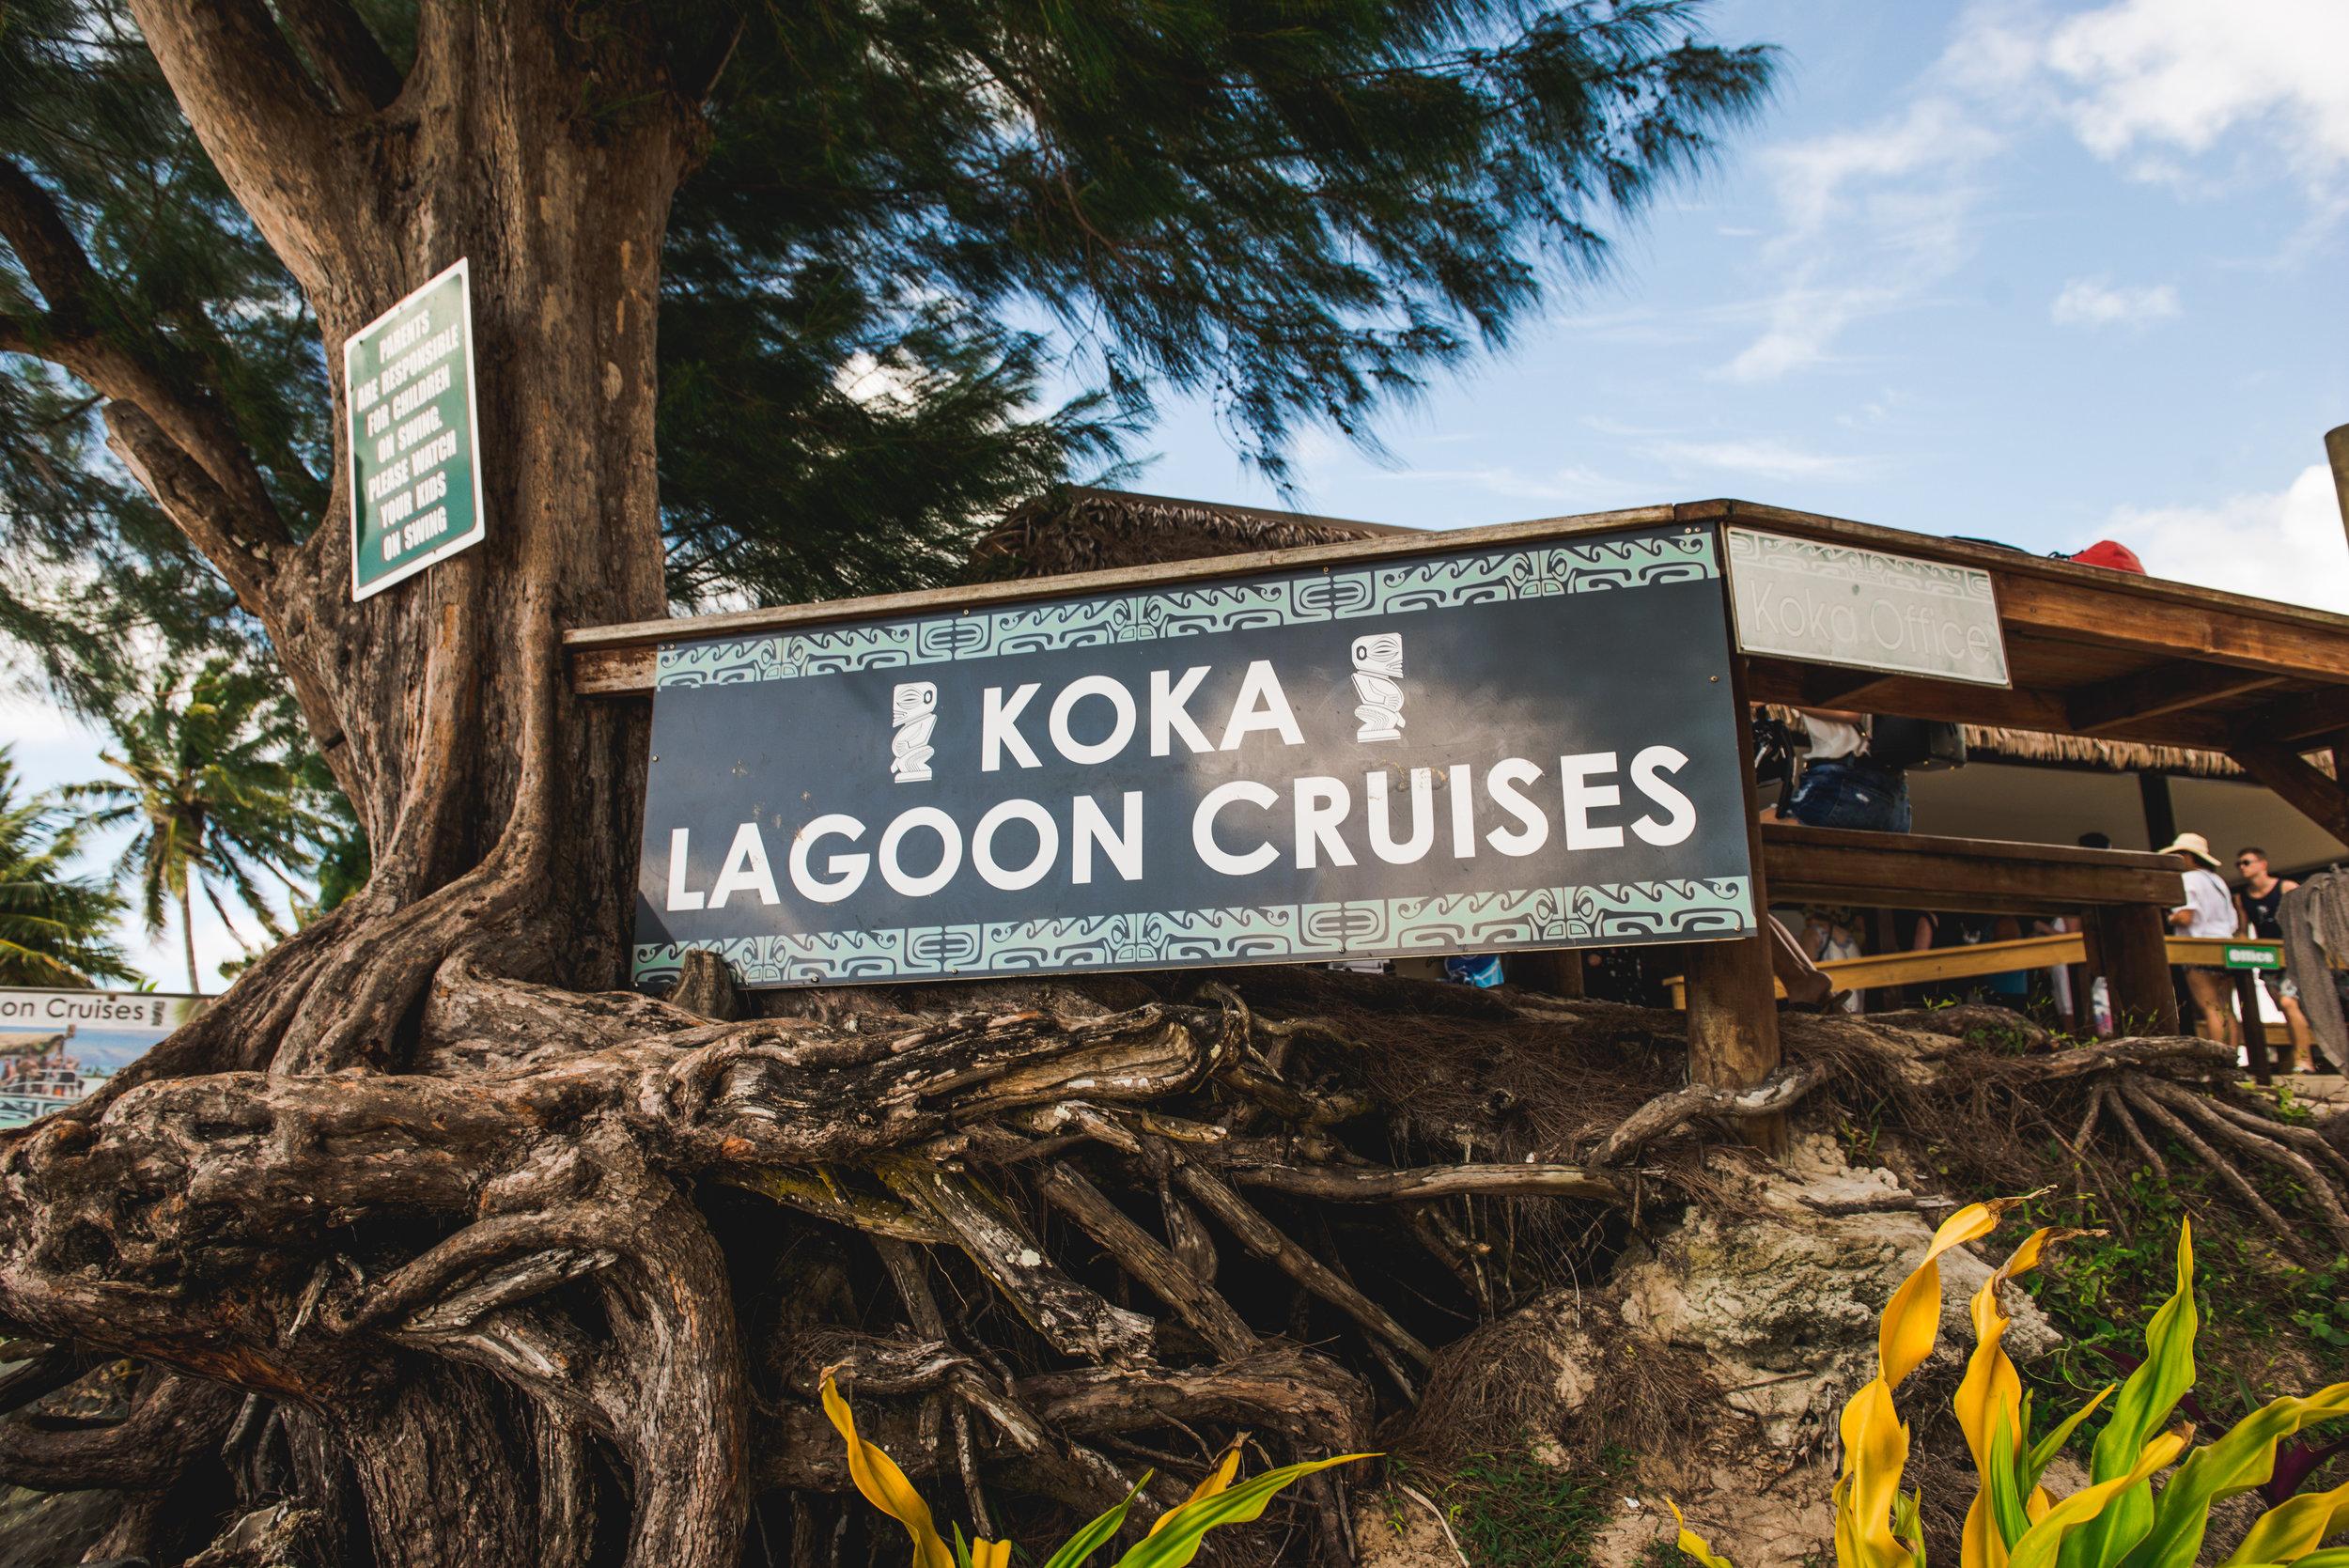 koka-lagoon-cruises-by-lisa-linh